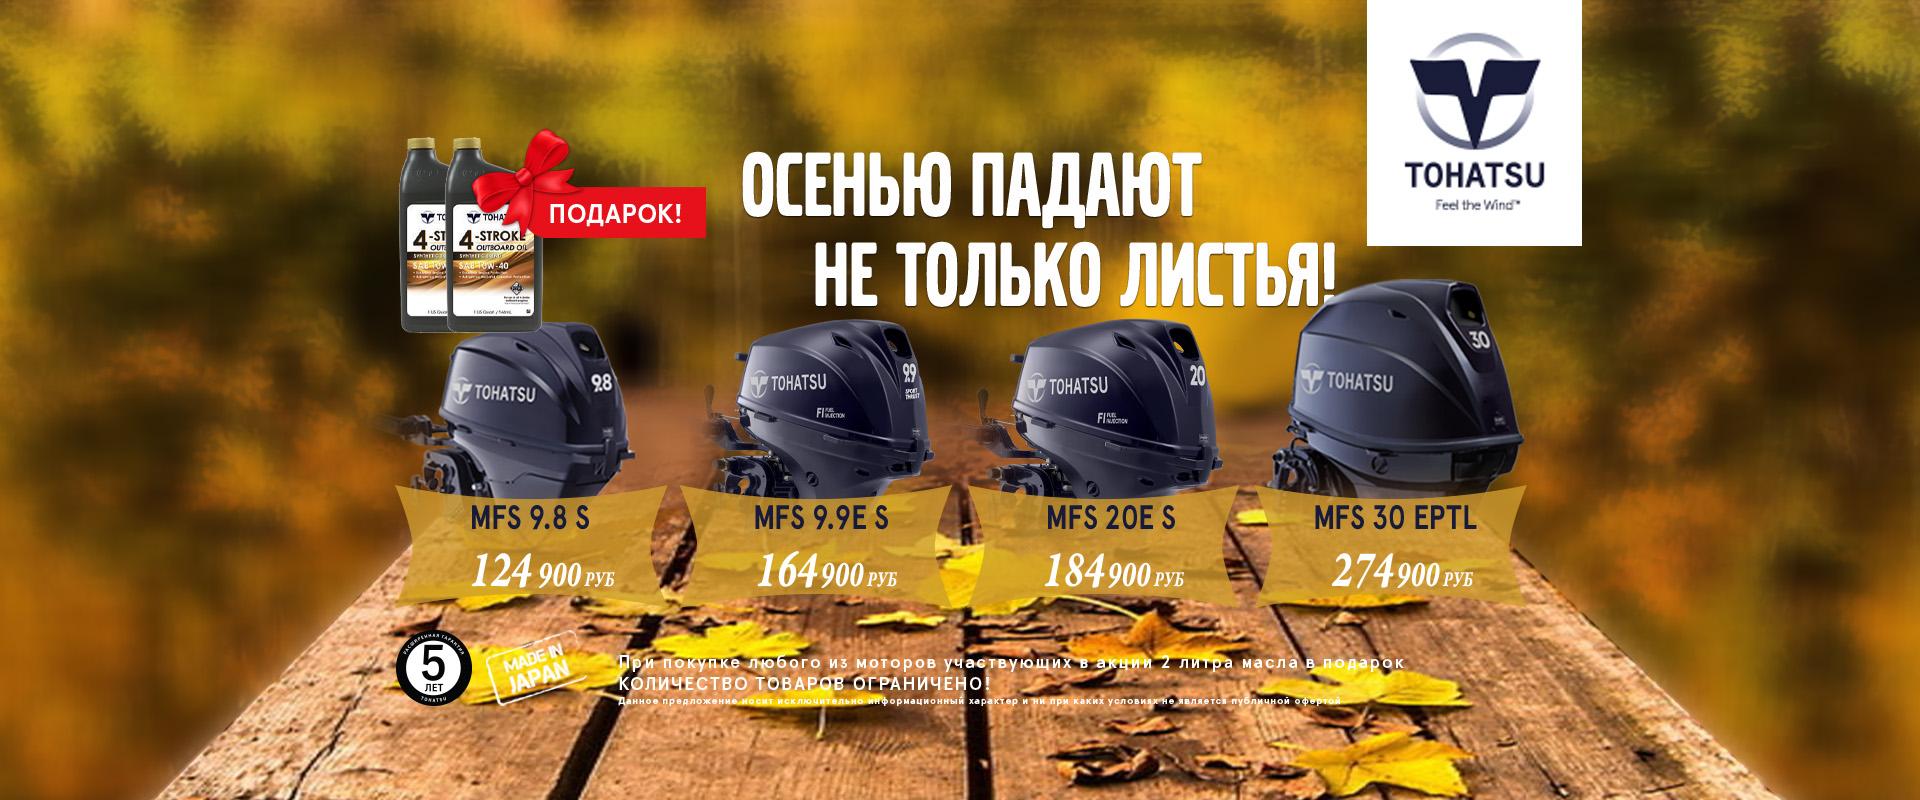 http://motohot24.ru/image/cache/catalog/tohatsu_offers_232-1920x800.jpg